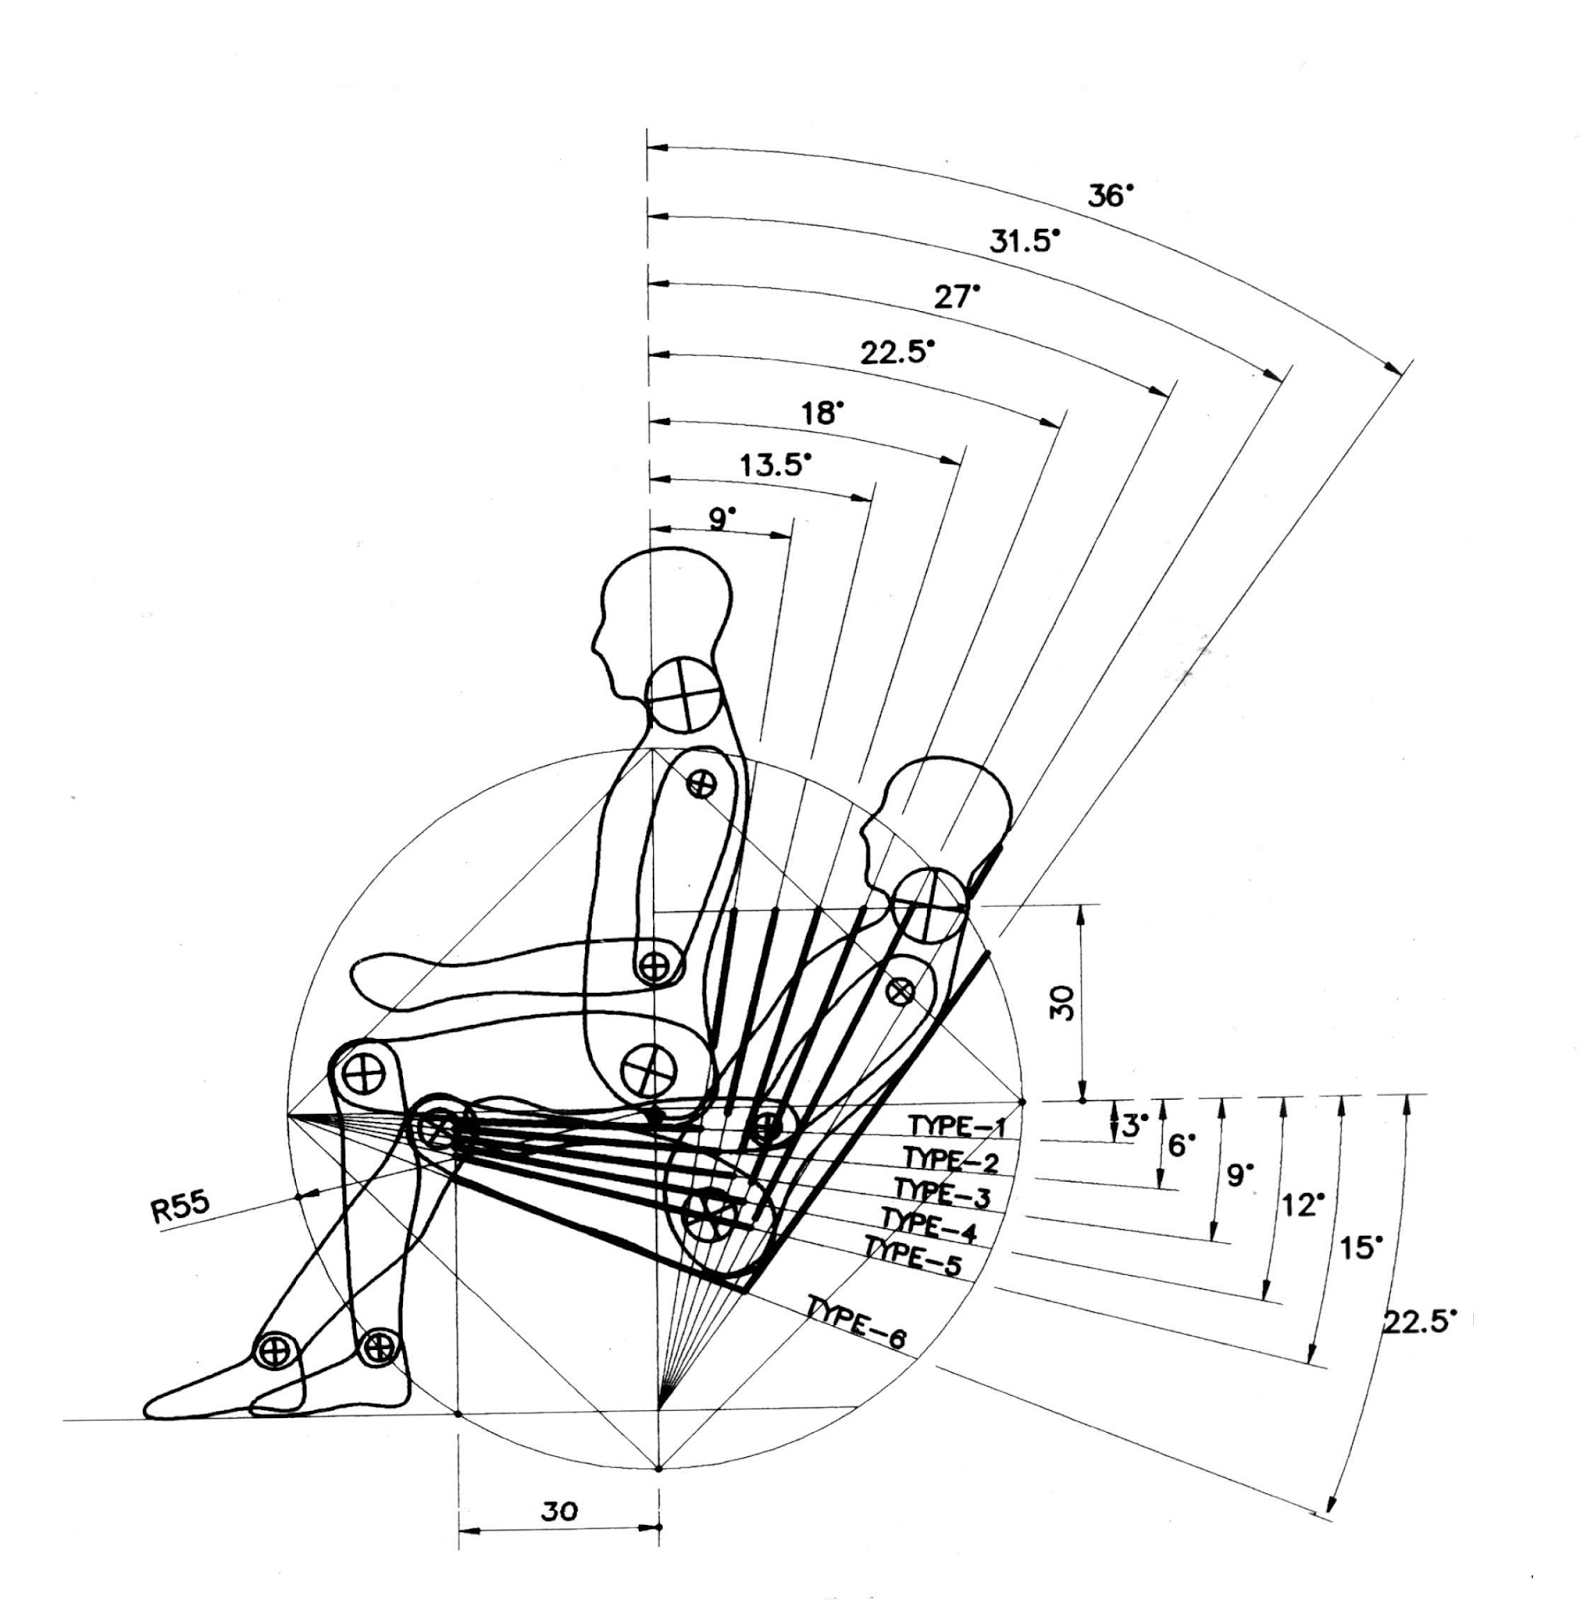 Ergonomics Of Seating